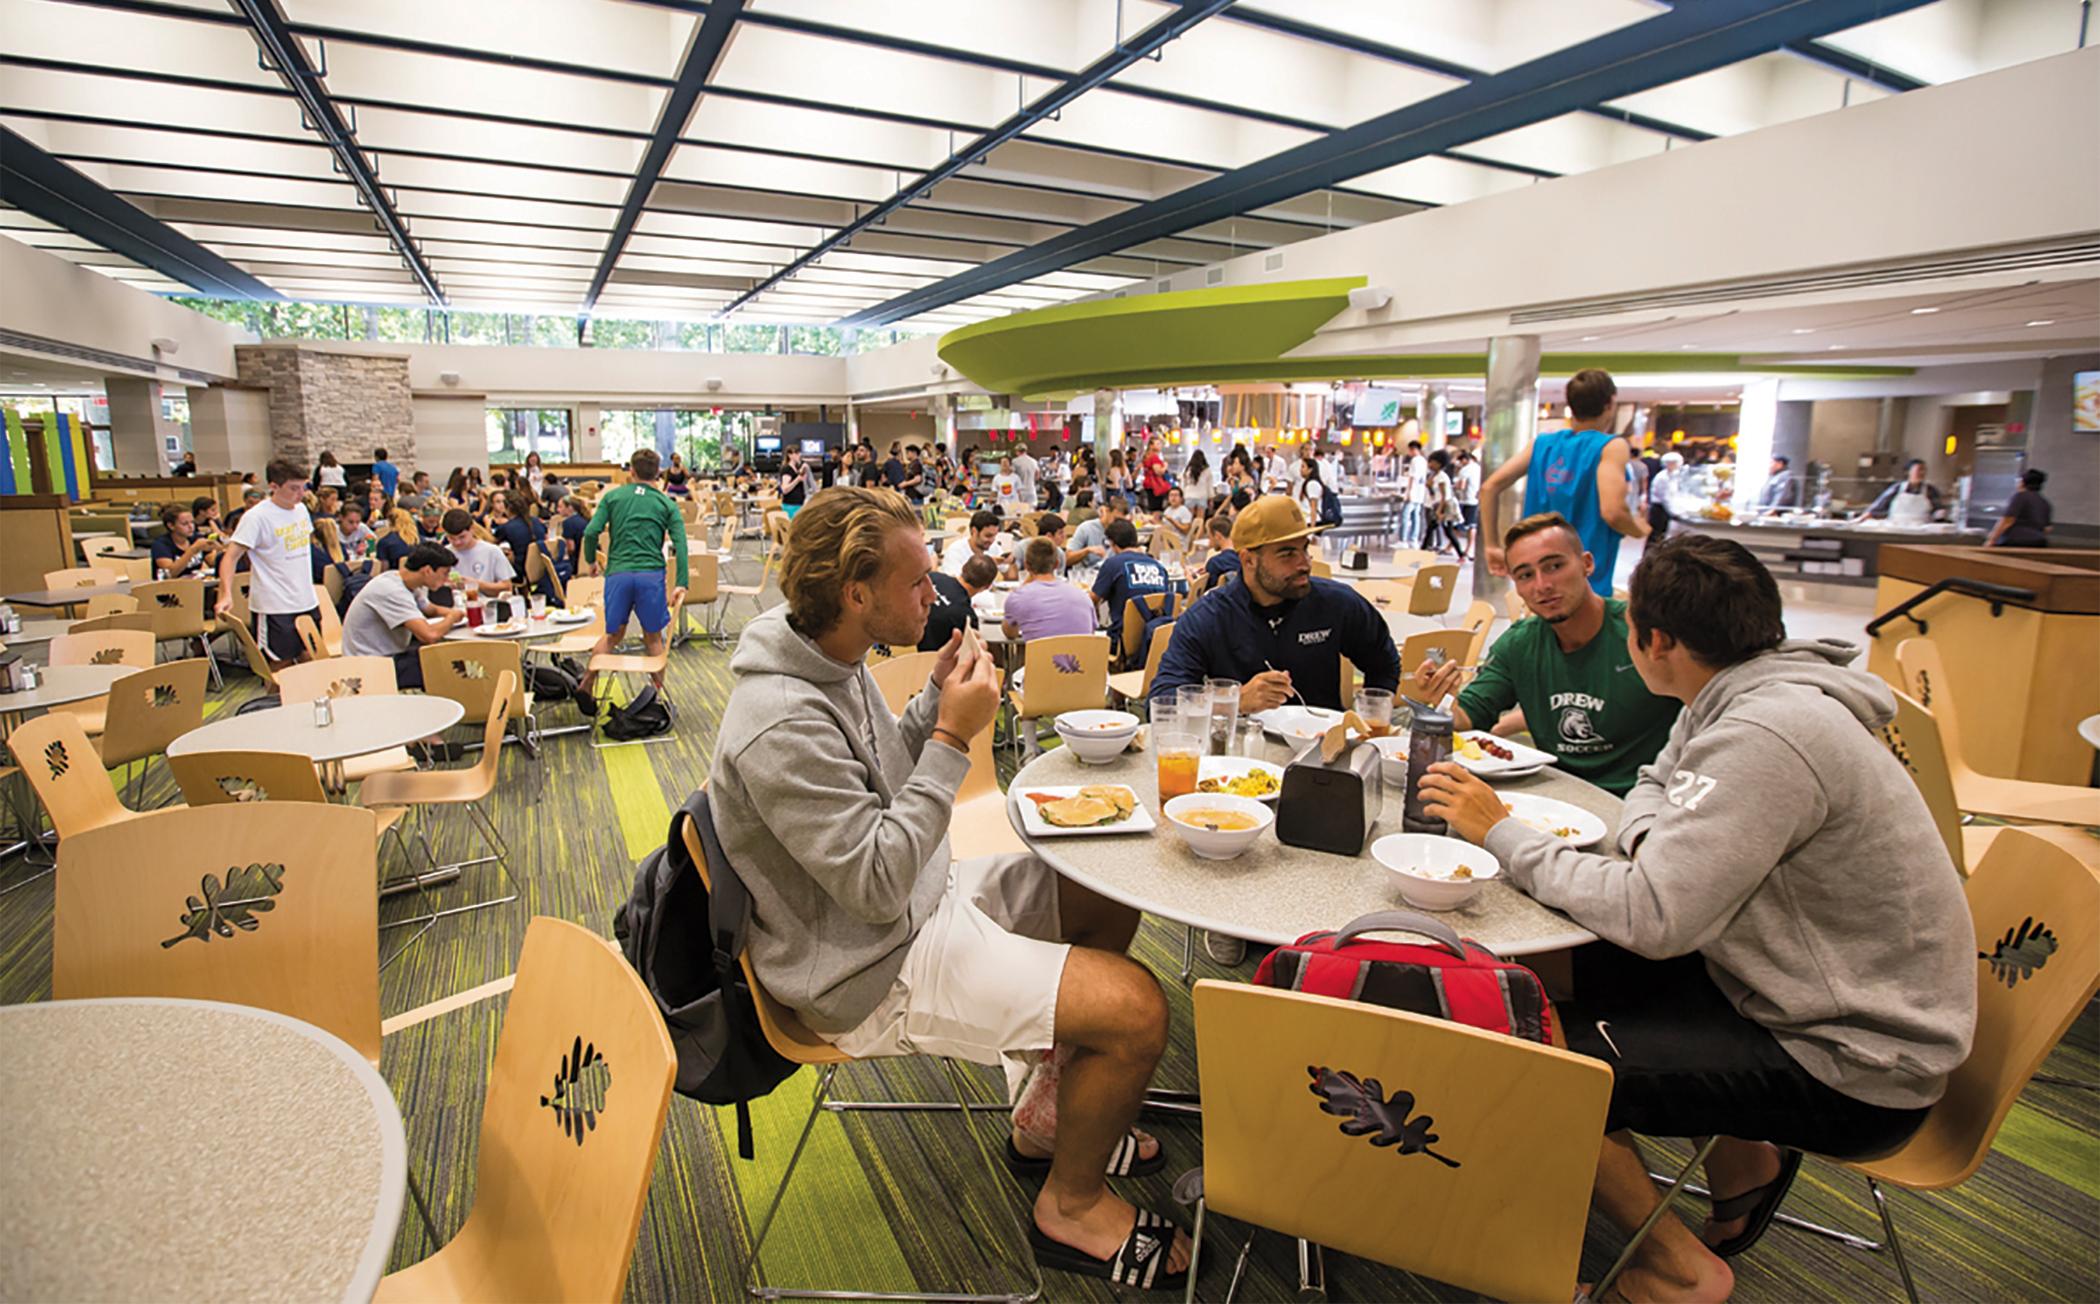 Drew dining hall